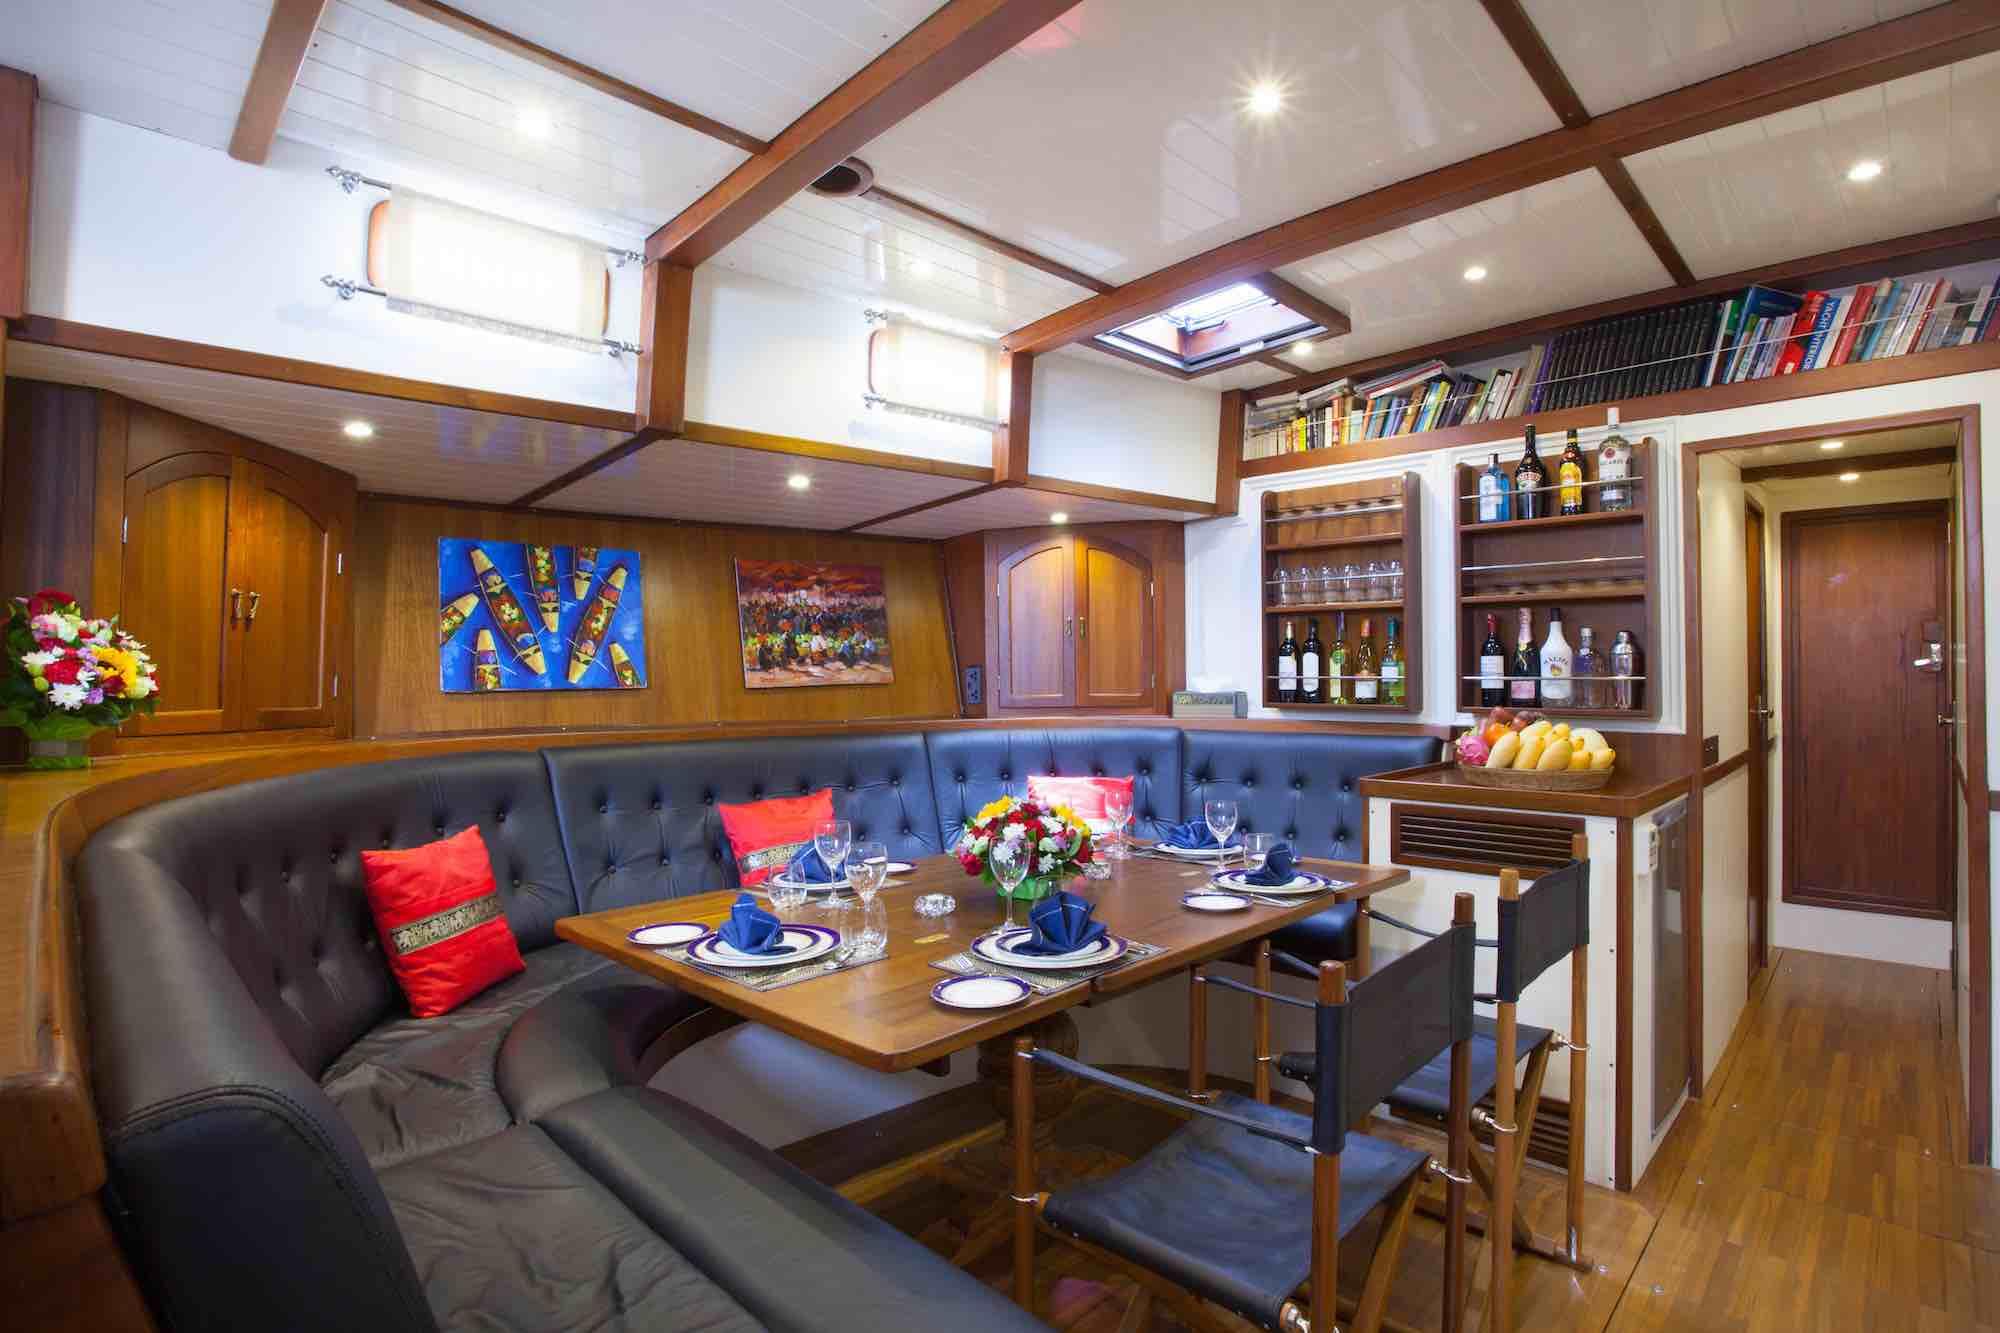 Dallinghoo_lounge area on boat sailing in Mergui 1_XS.jpeg